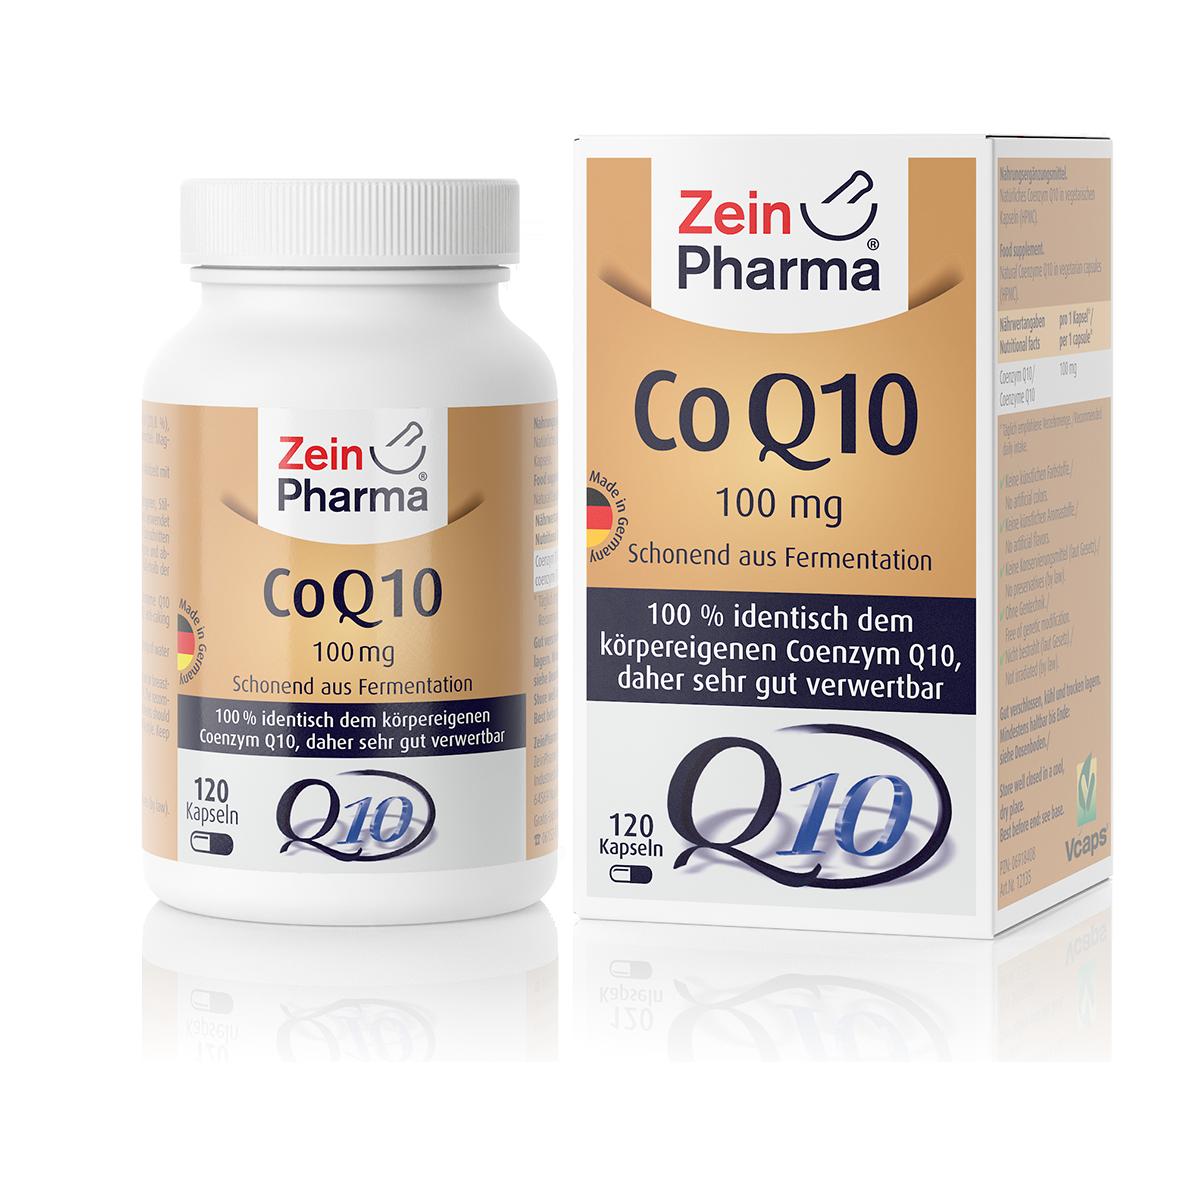 Zeinpharma Coenzym Q10 100 mg Kapseln